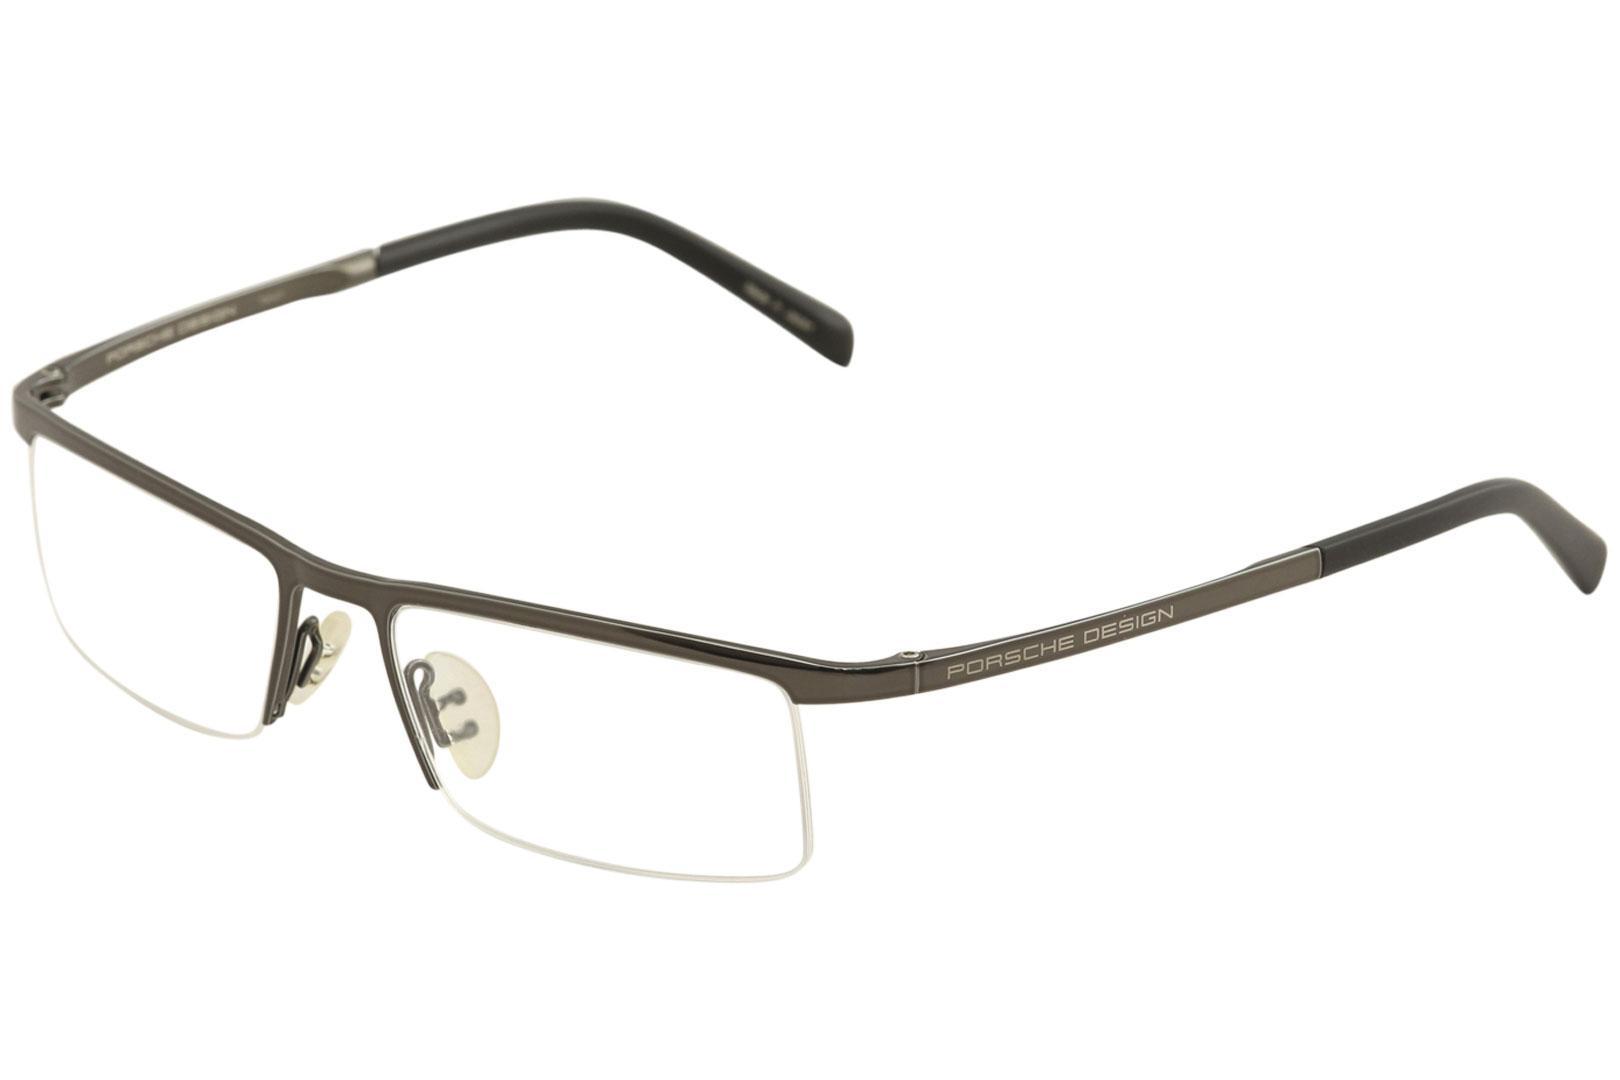 bb46c9180418 Porsche Design Men's Eyeglasses P8129 P/8129 Half Rim Titanium Optical Frame  by Porsche Design